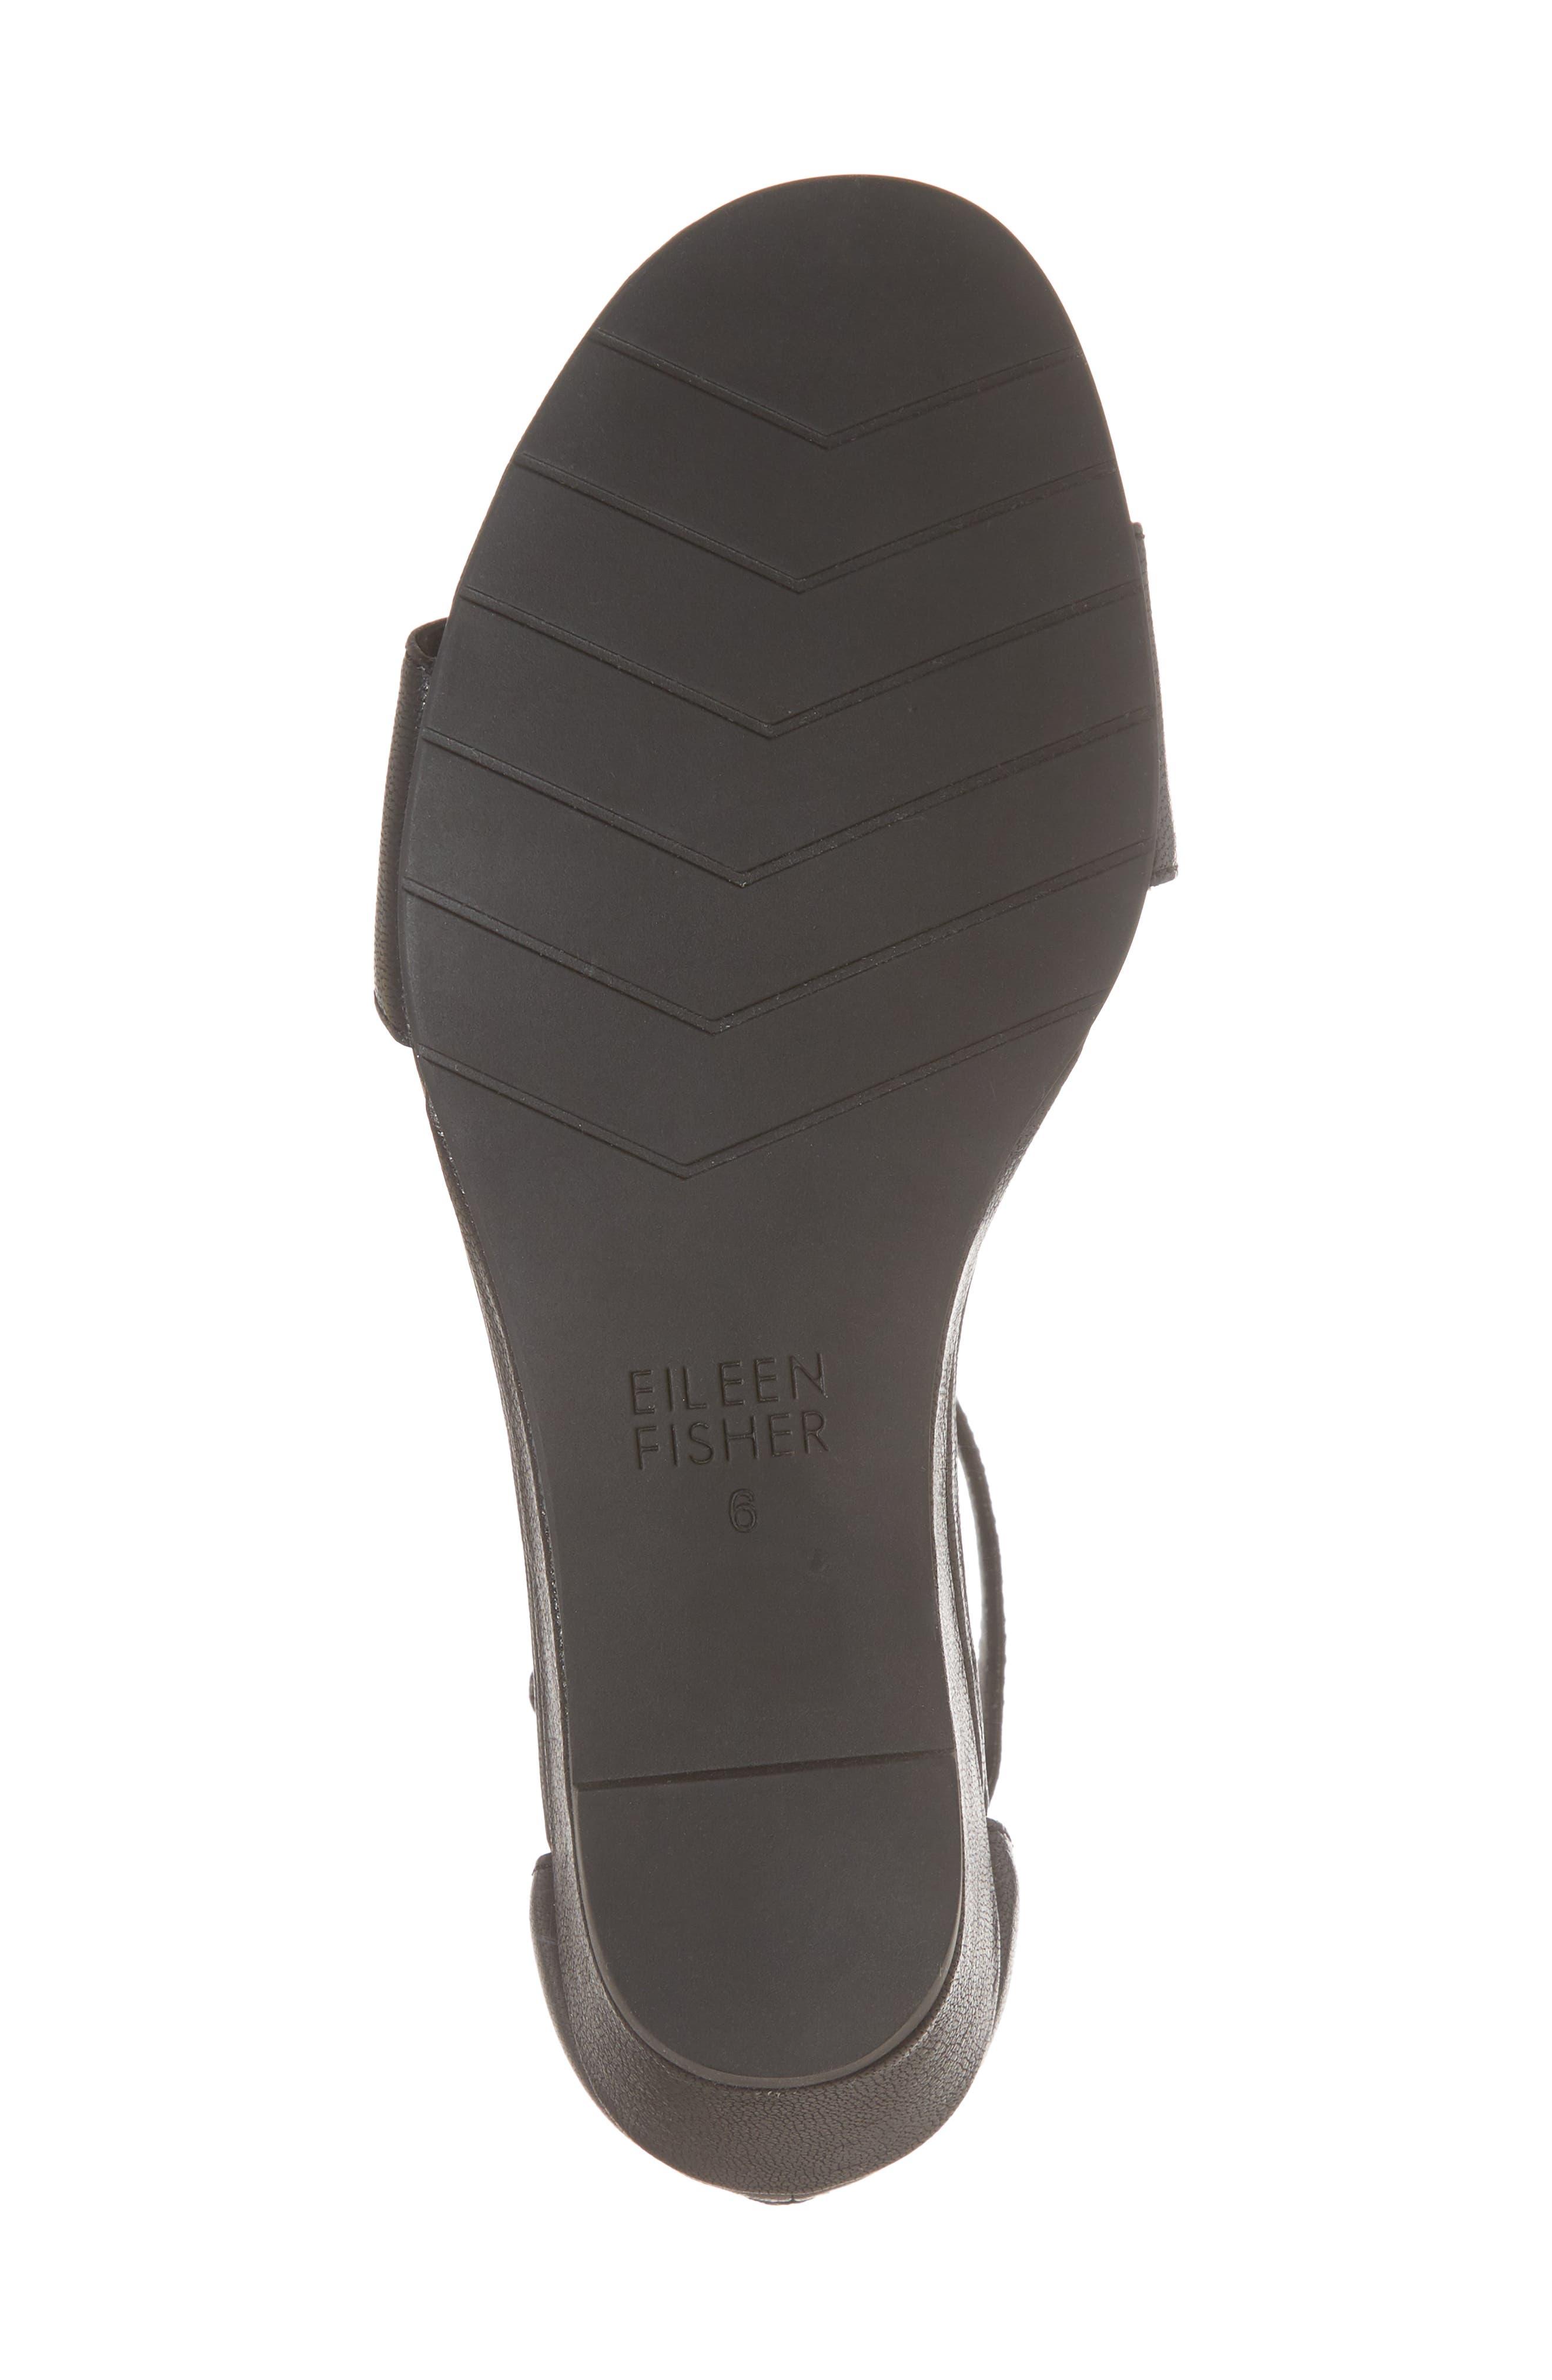 Mara Ankle Strap Wedge Sandal,                             Alternate thumbnail 6, color,                             Black Leather